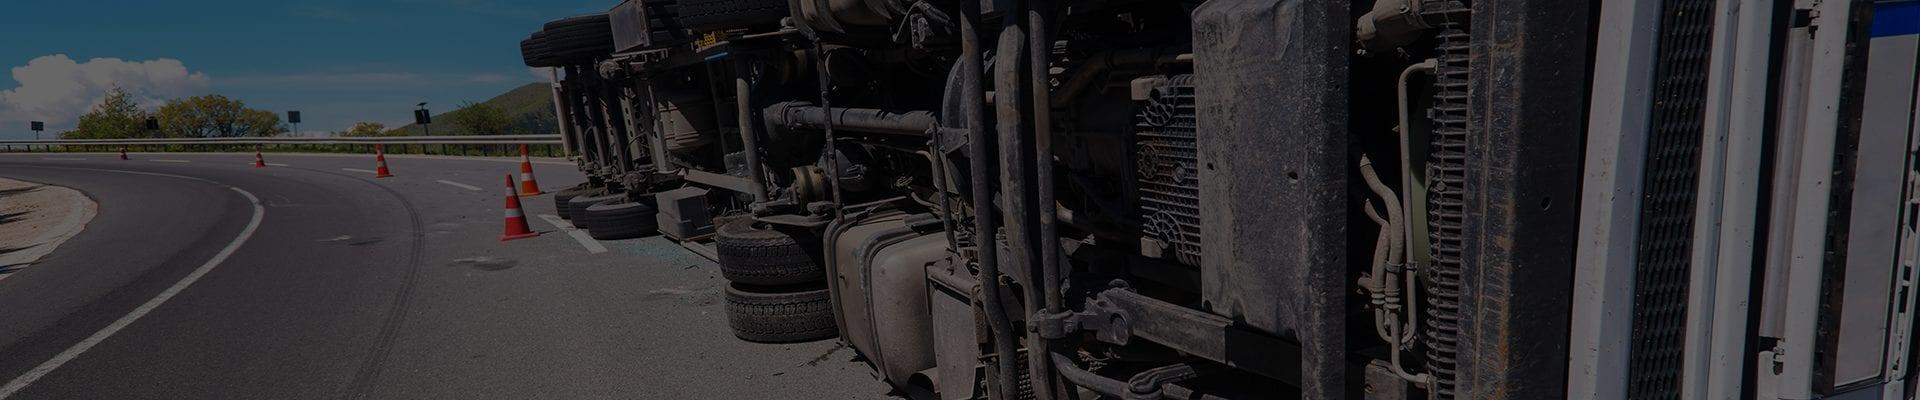 truck accident in arizona